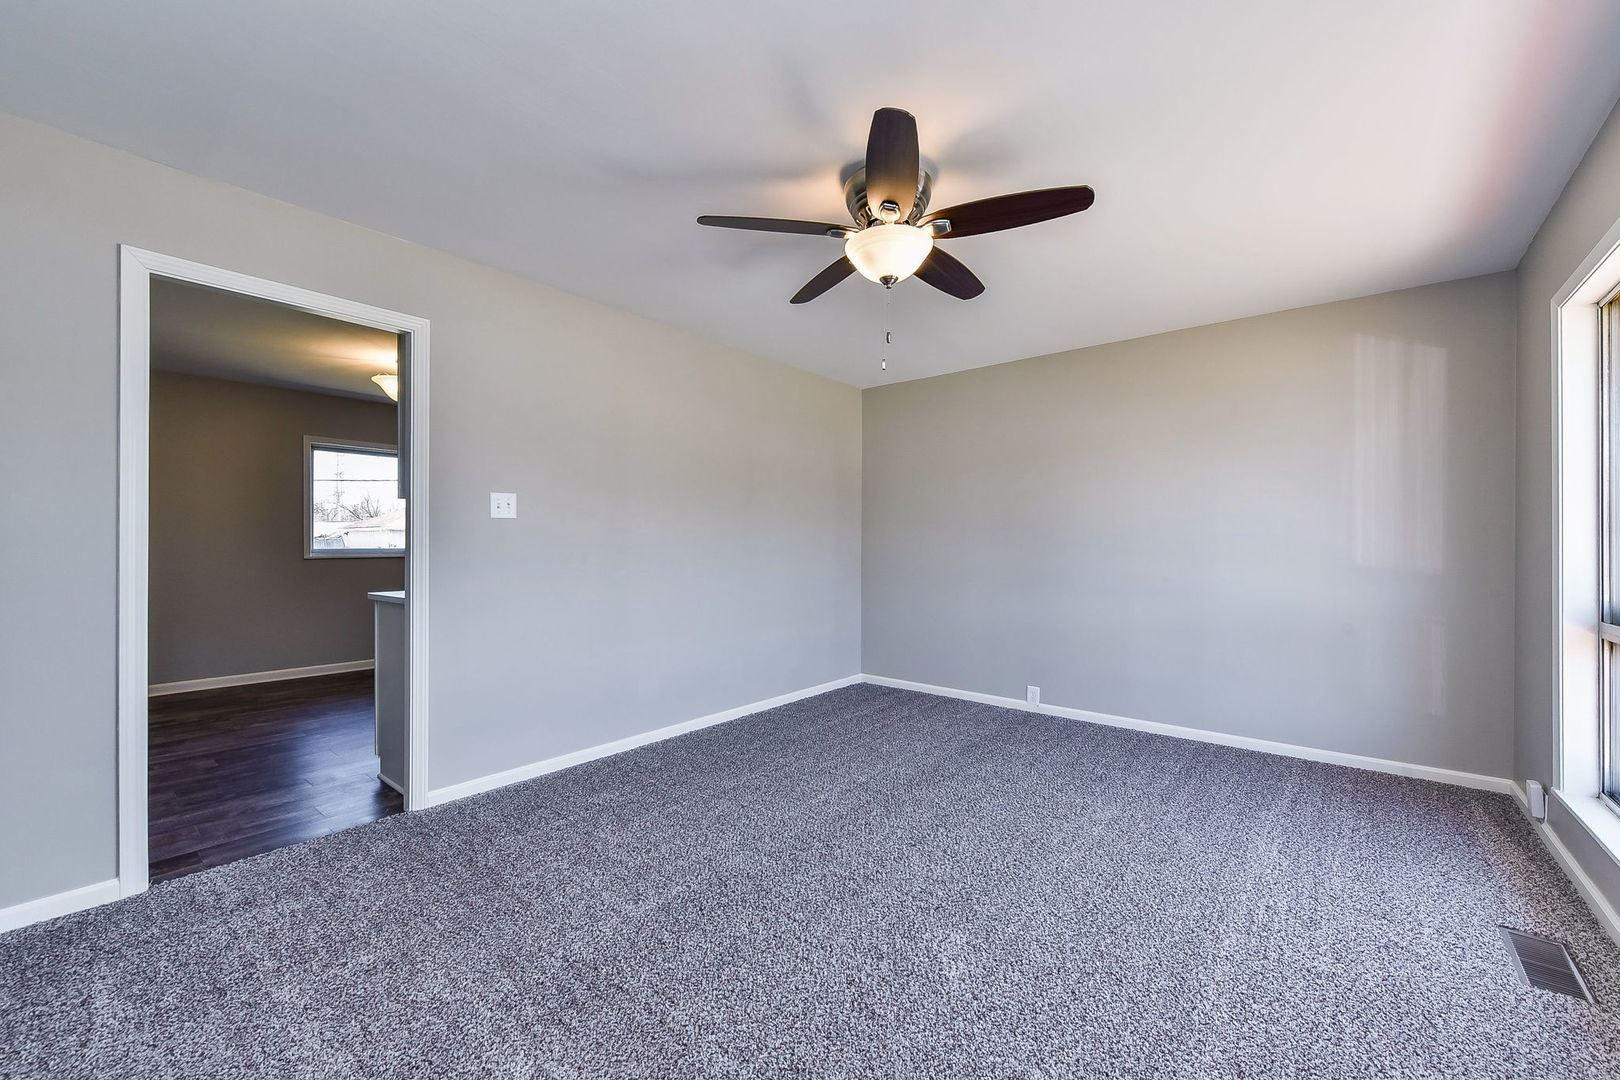 Photo of 553 Belmont Drive, Romeoville, IL 60446 (MLS # 11024385)